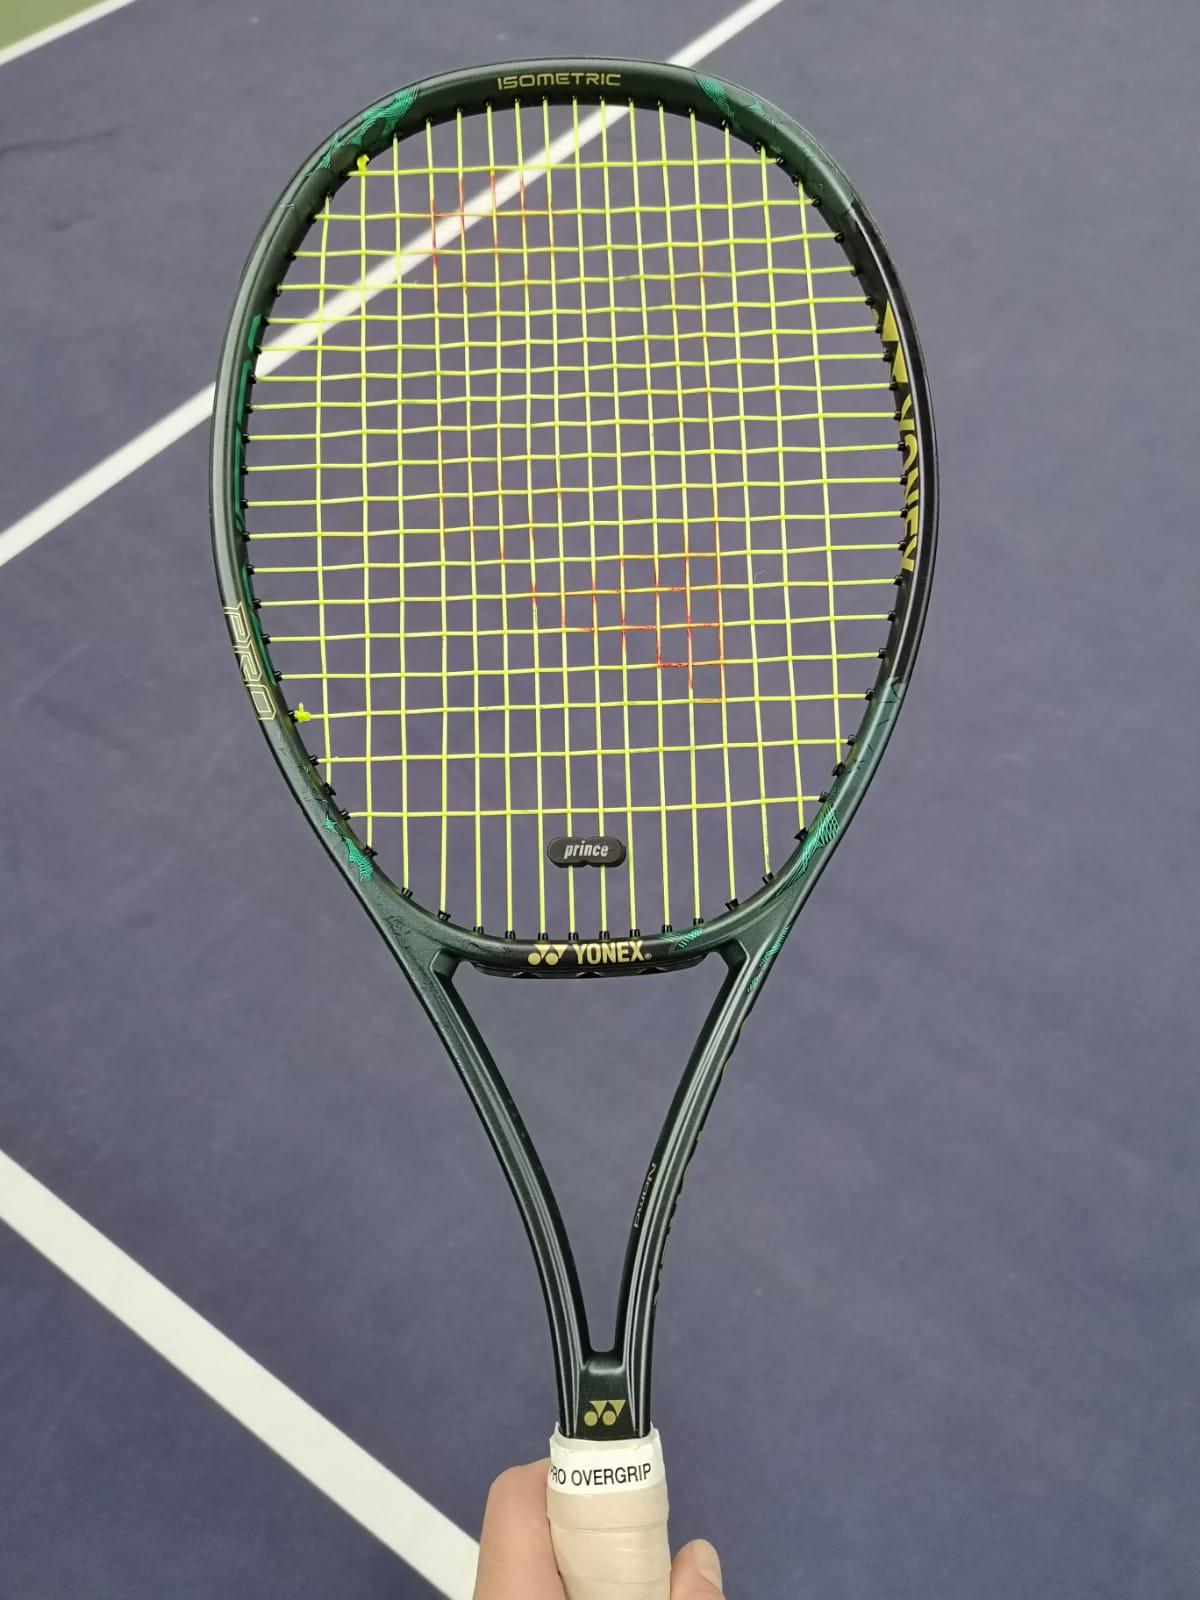 Yonex VCORE Pro 97 Racquet Review